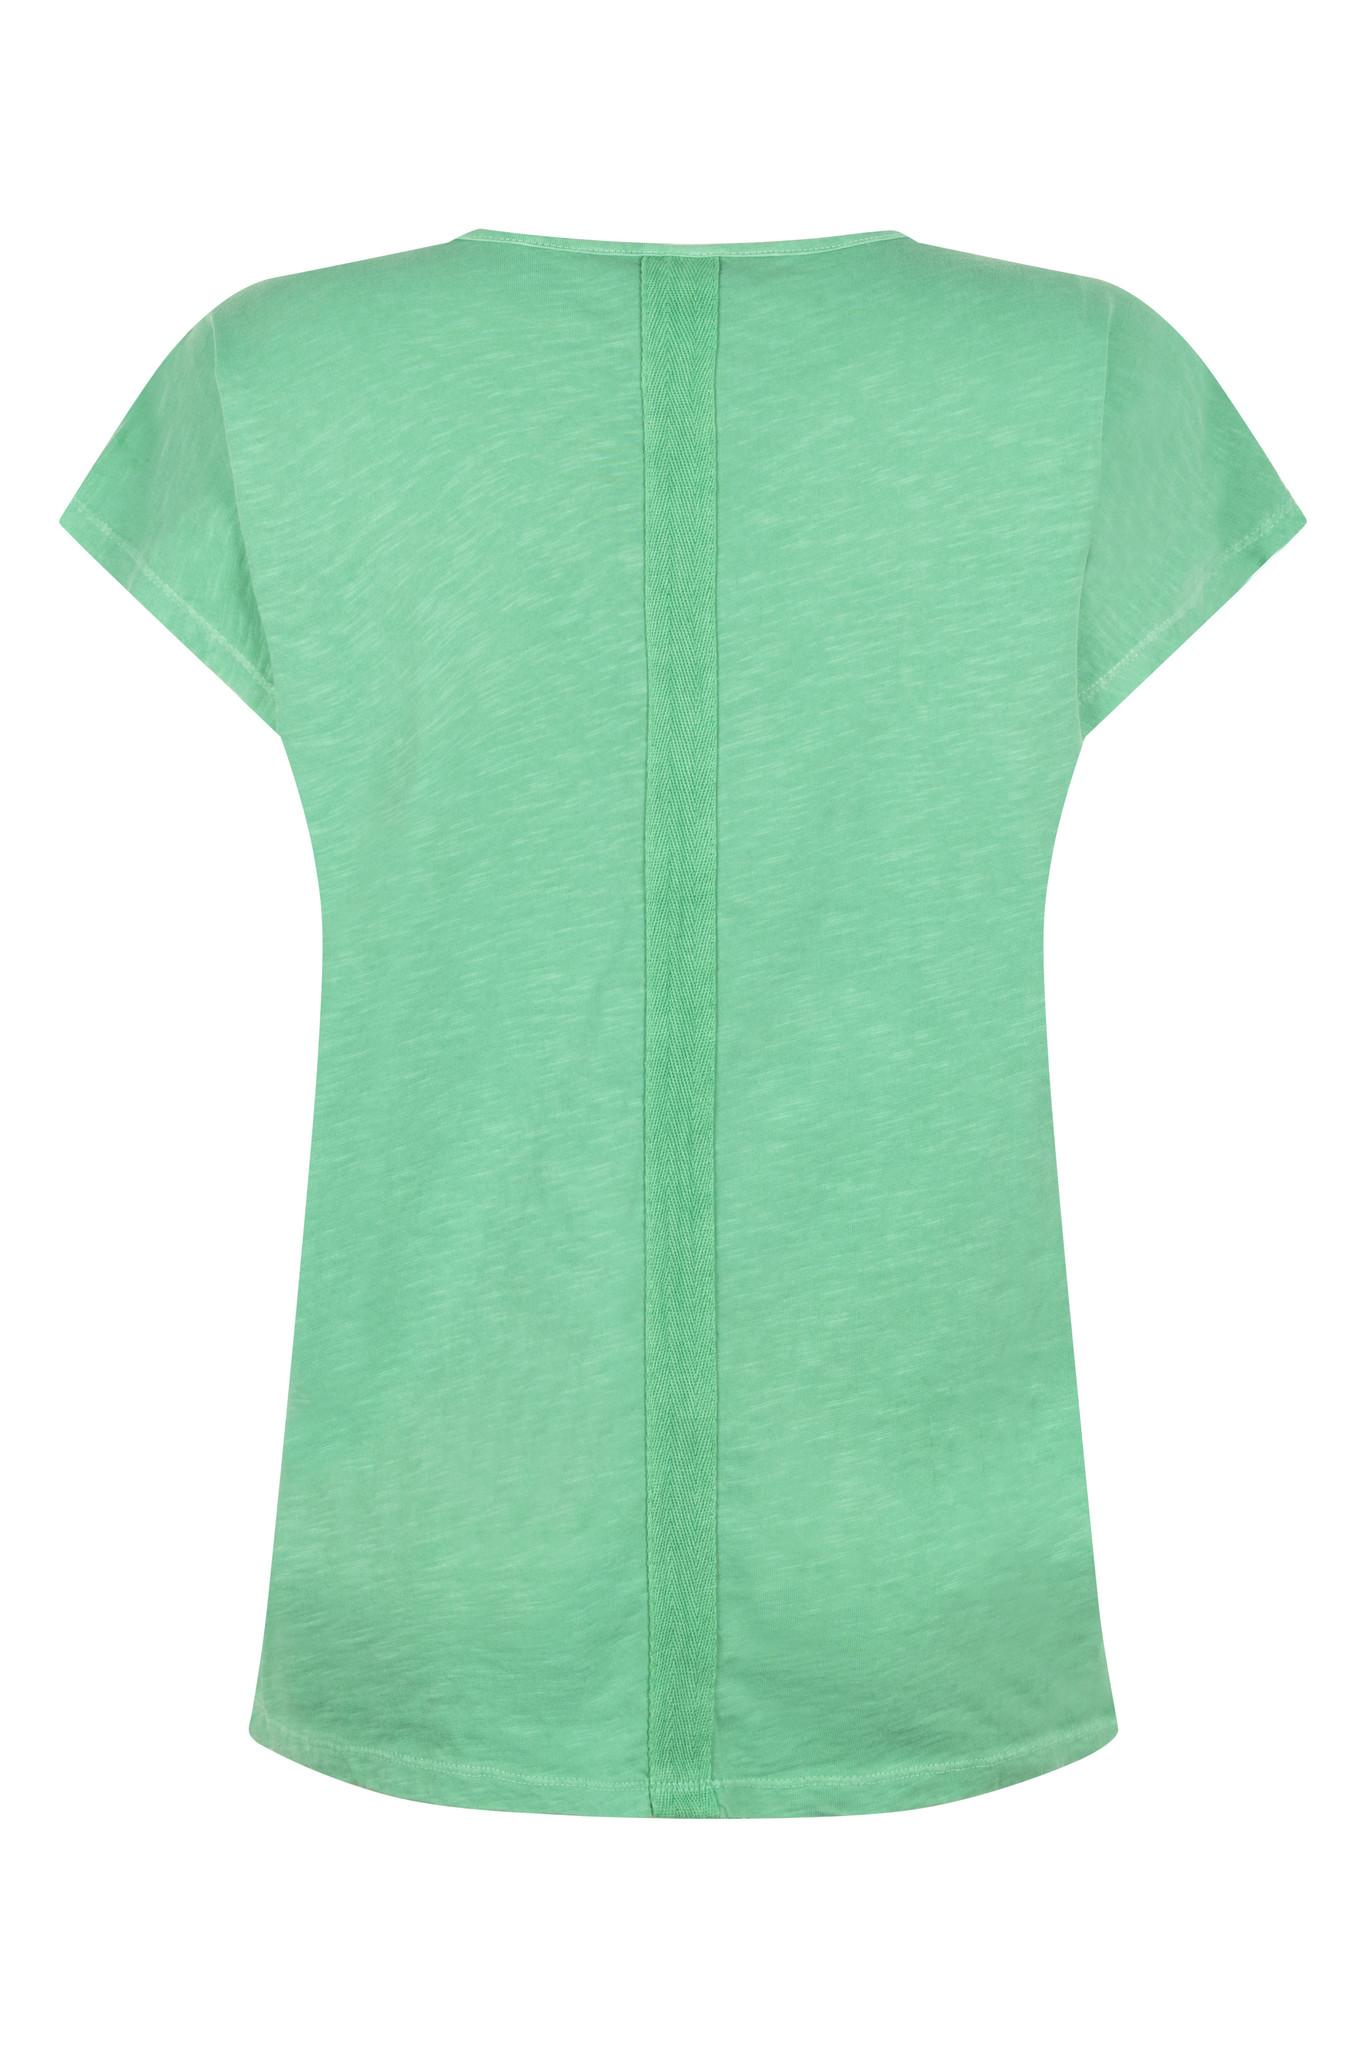 Zoso Zoso Saskia t-shirt dye garment green